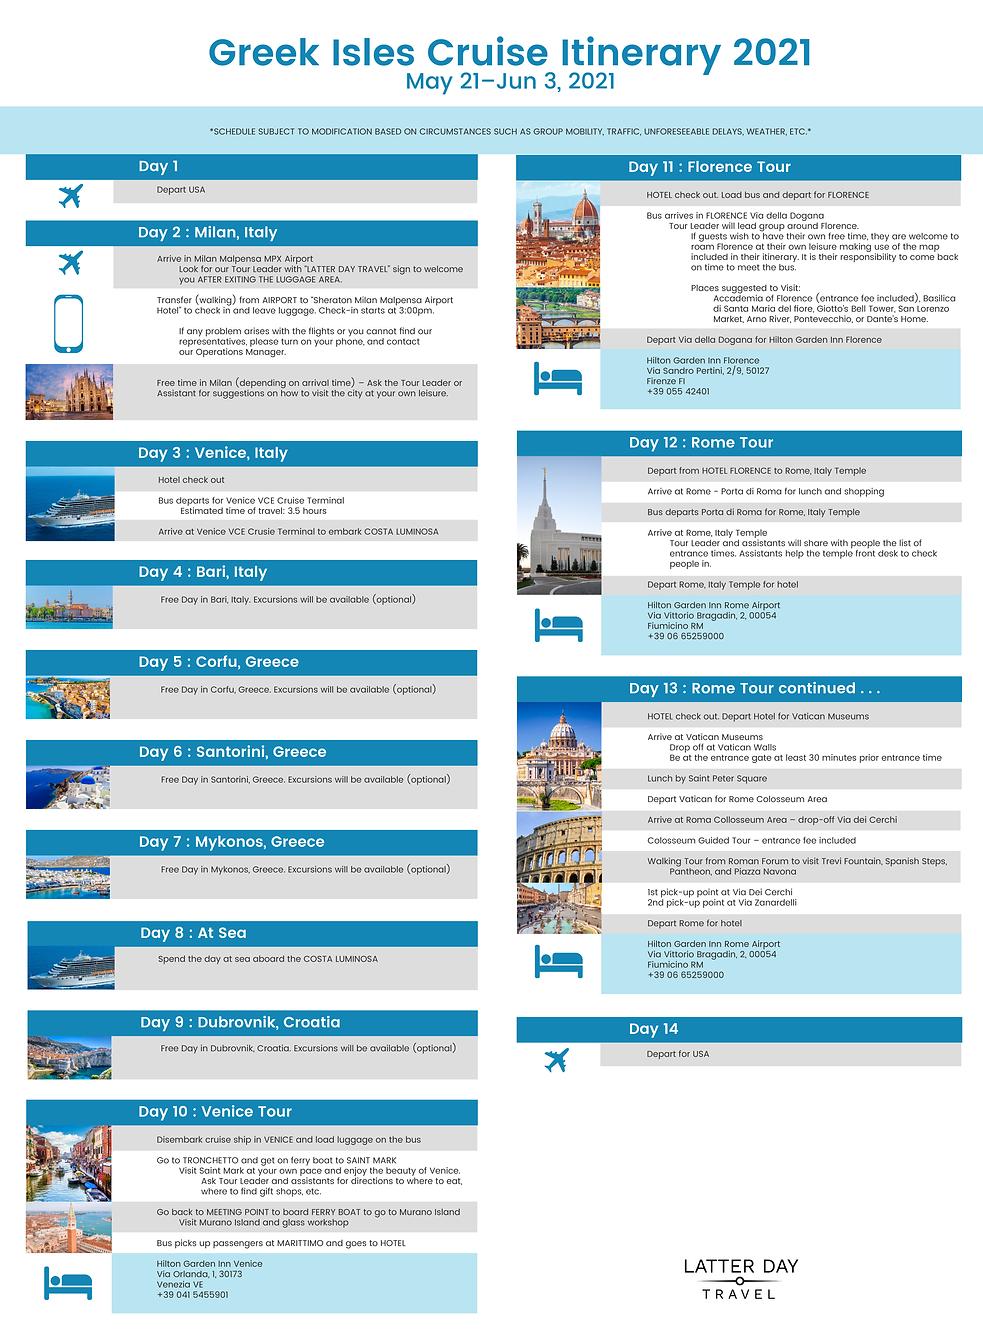 LatterDayTravel_Itinerary_Graphic_Greek_